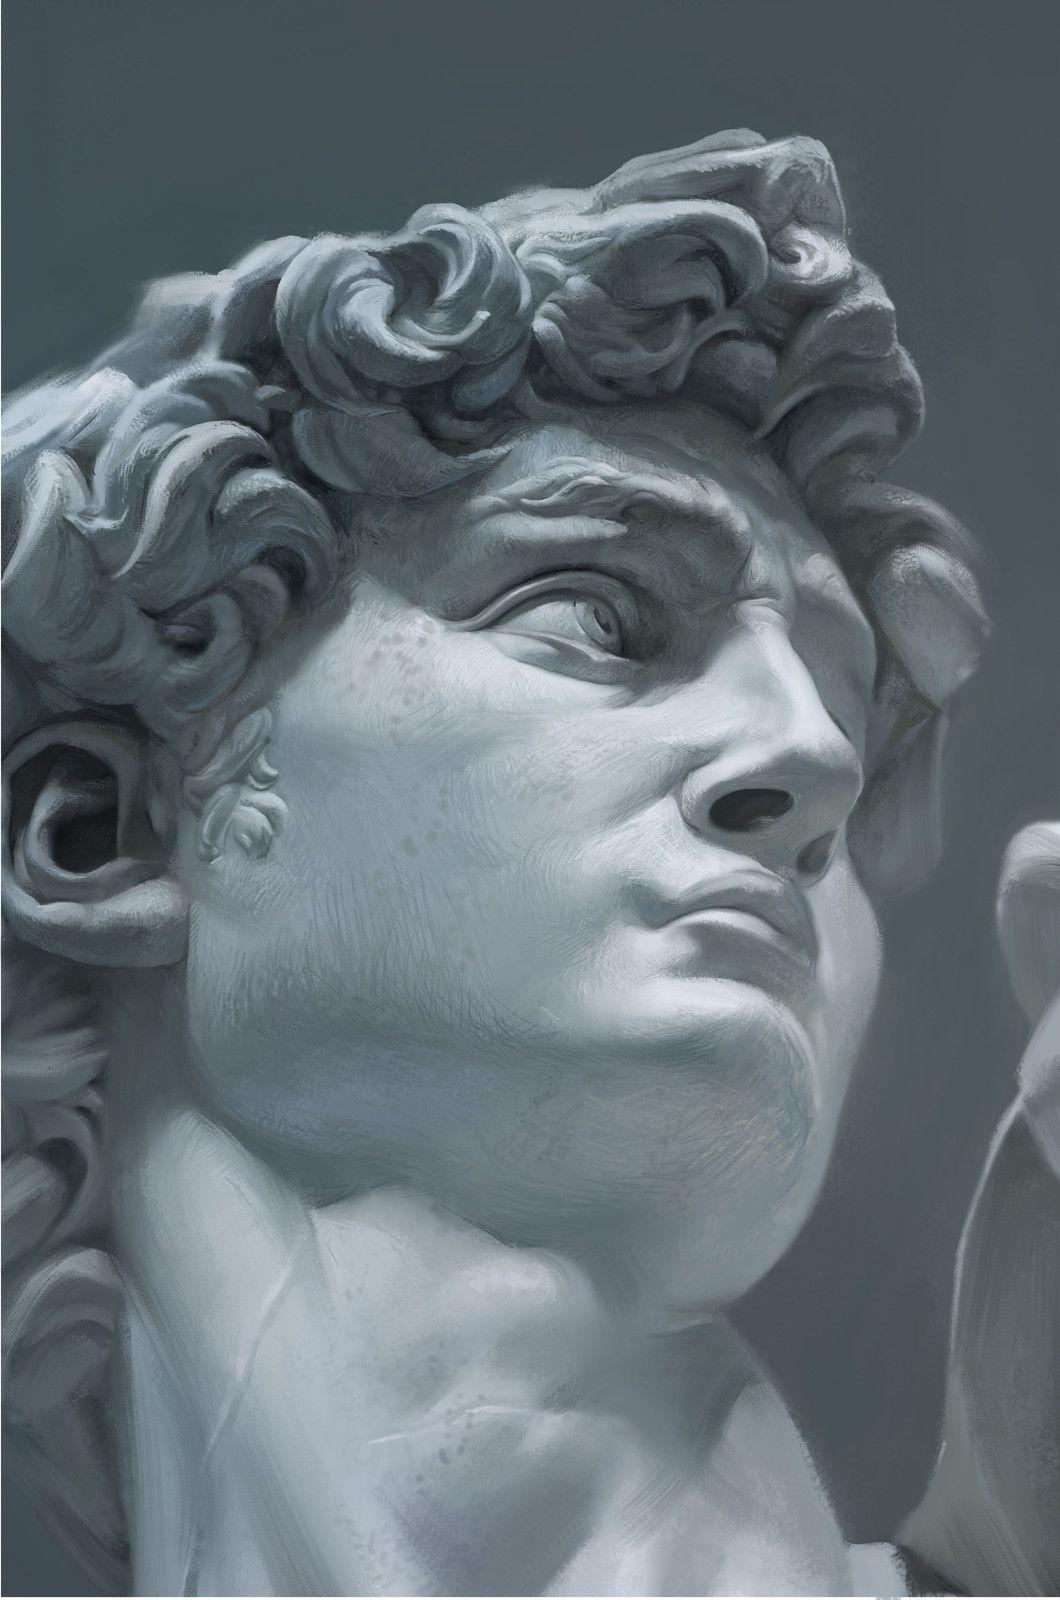 david, ShibaNinja Z